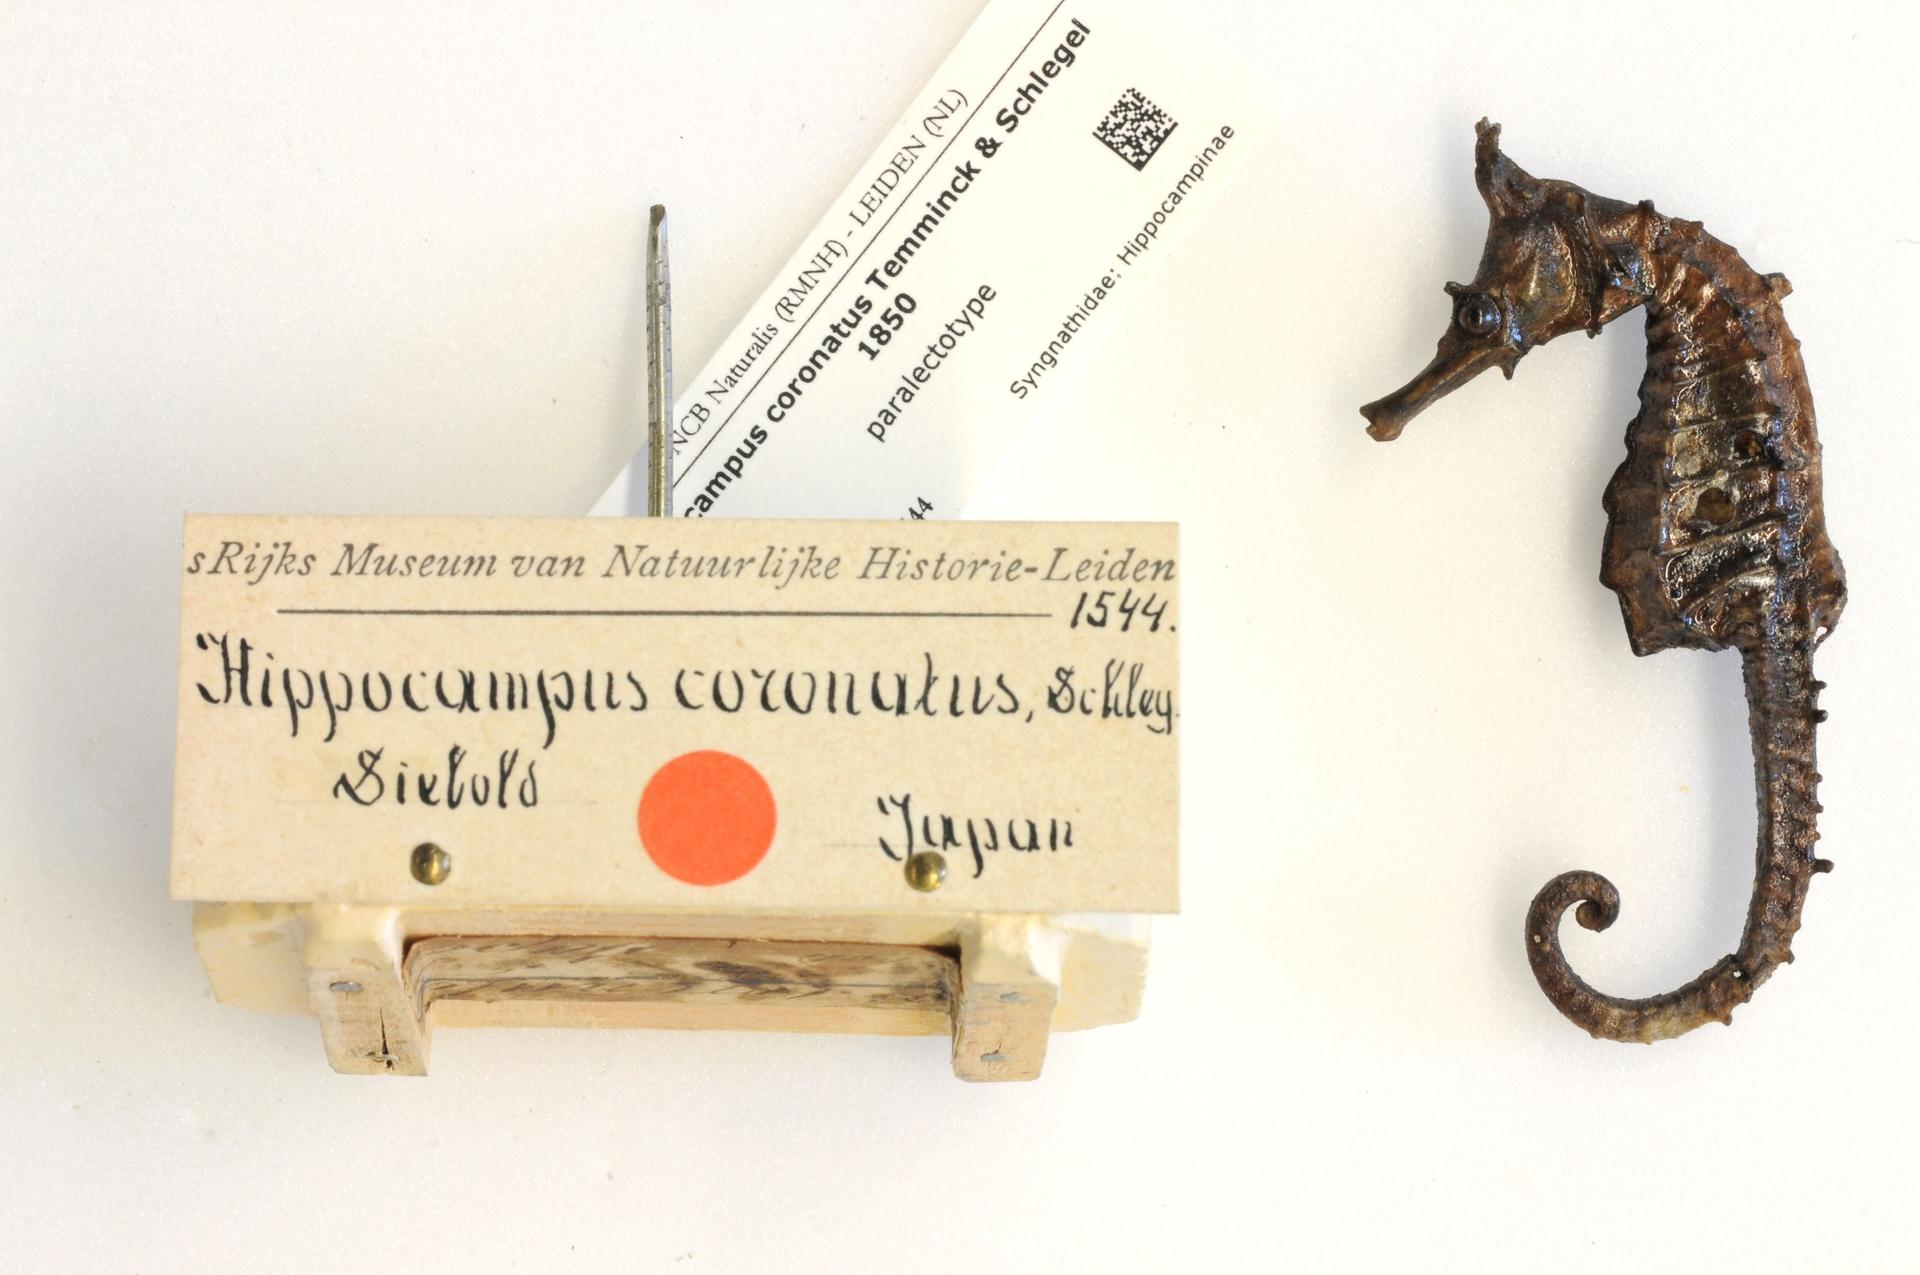 RMNH.PISC.D.1544 | Hippocampus coronatus Temminck & Schlegel 1850